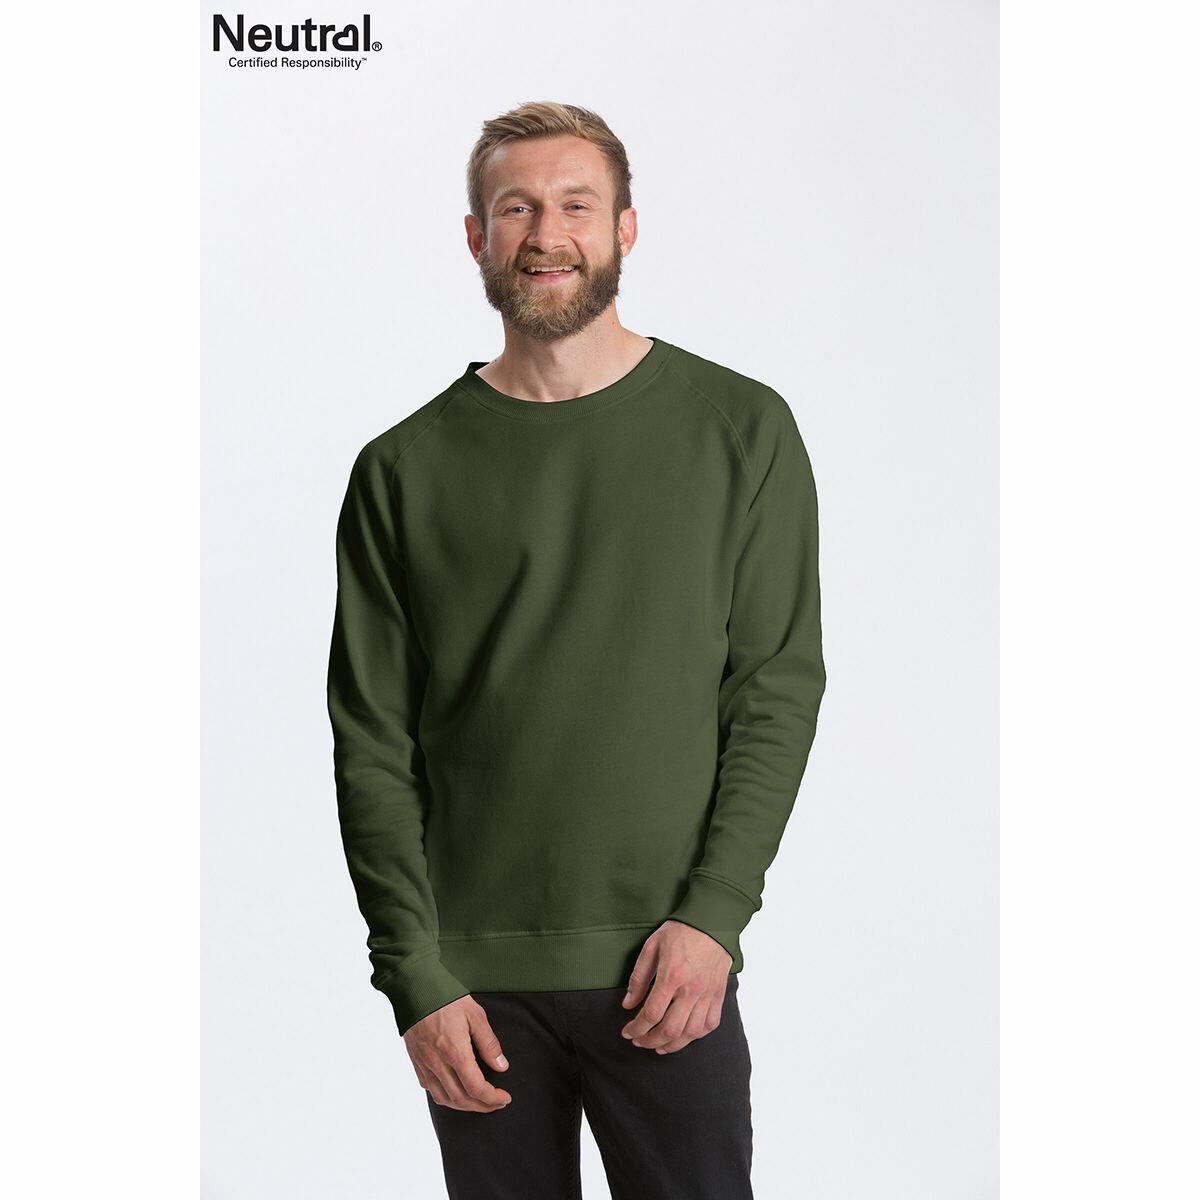 Neutral Organic Unisex Sweatshirt Green